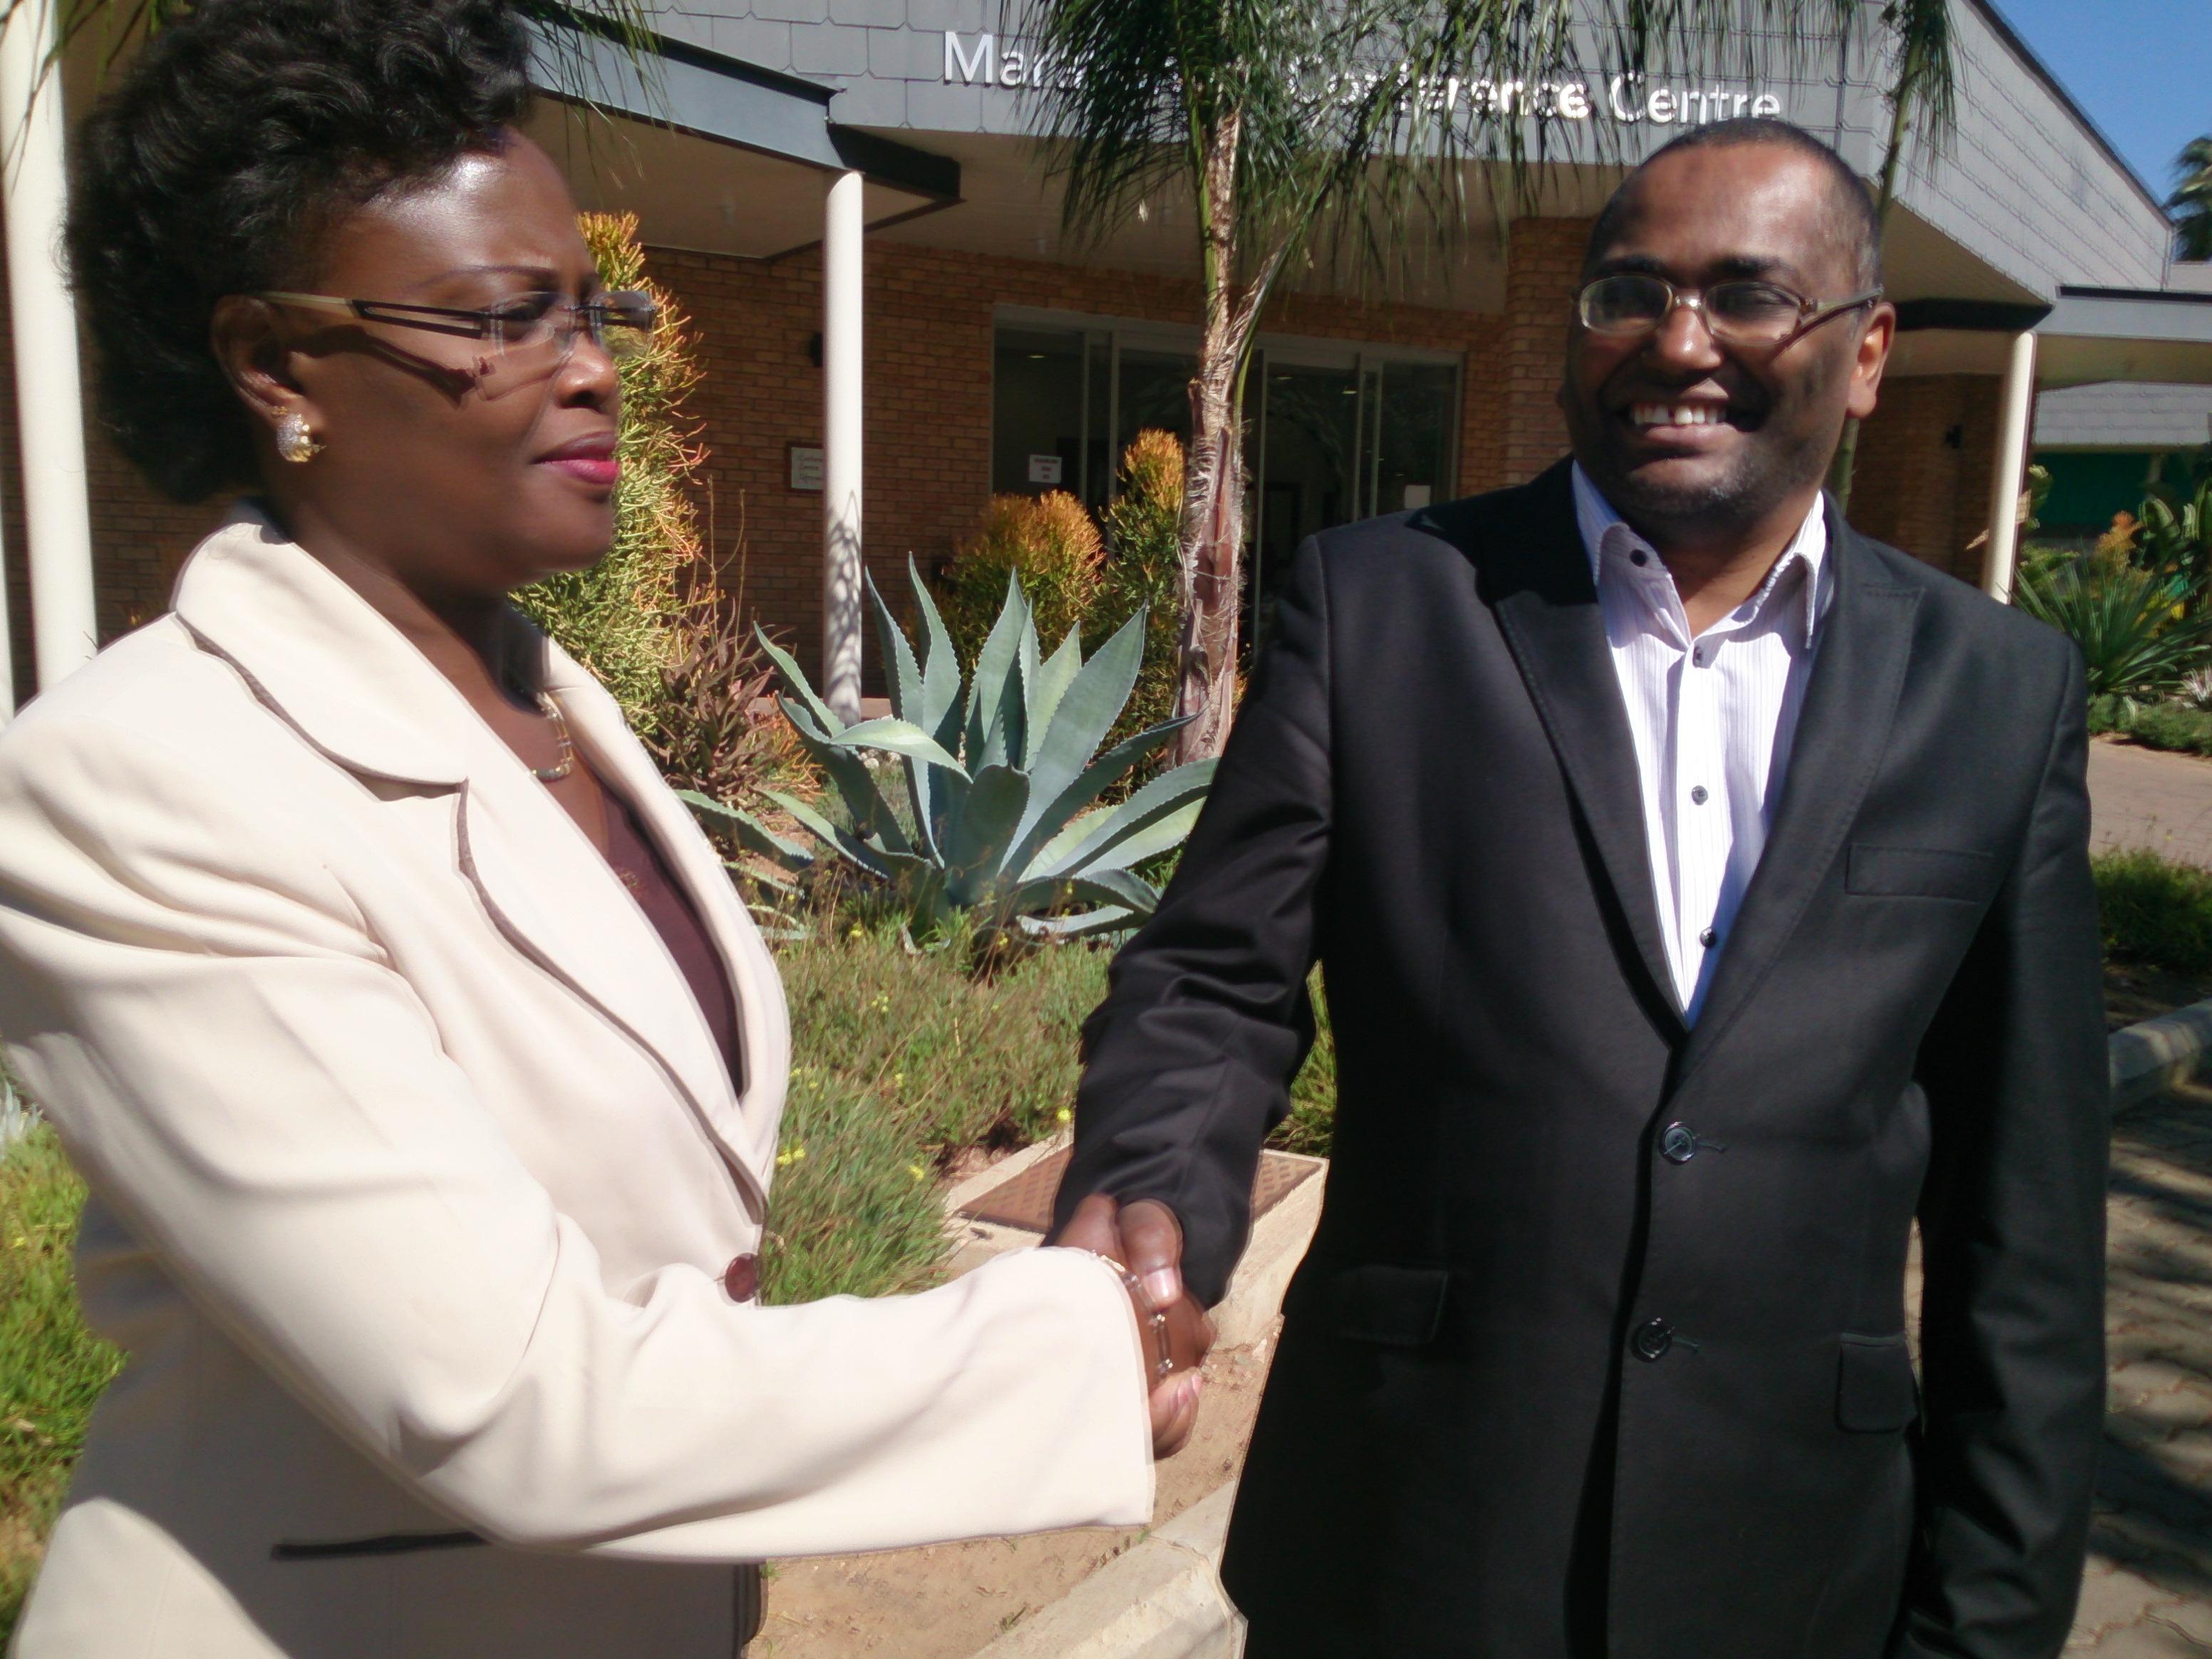 With hon. Alice Nzomukunda, former former Vice-President of Burundi